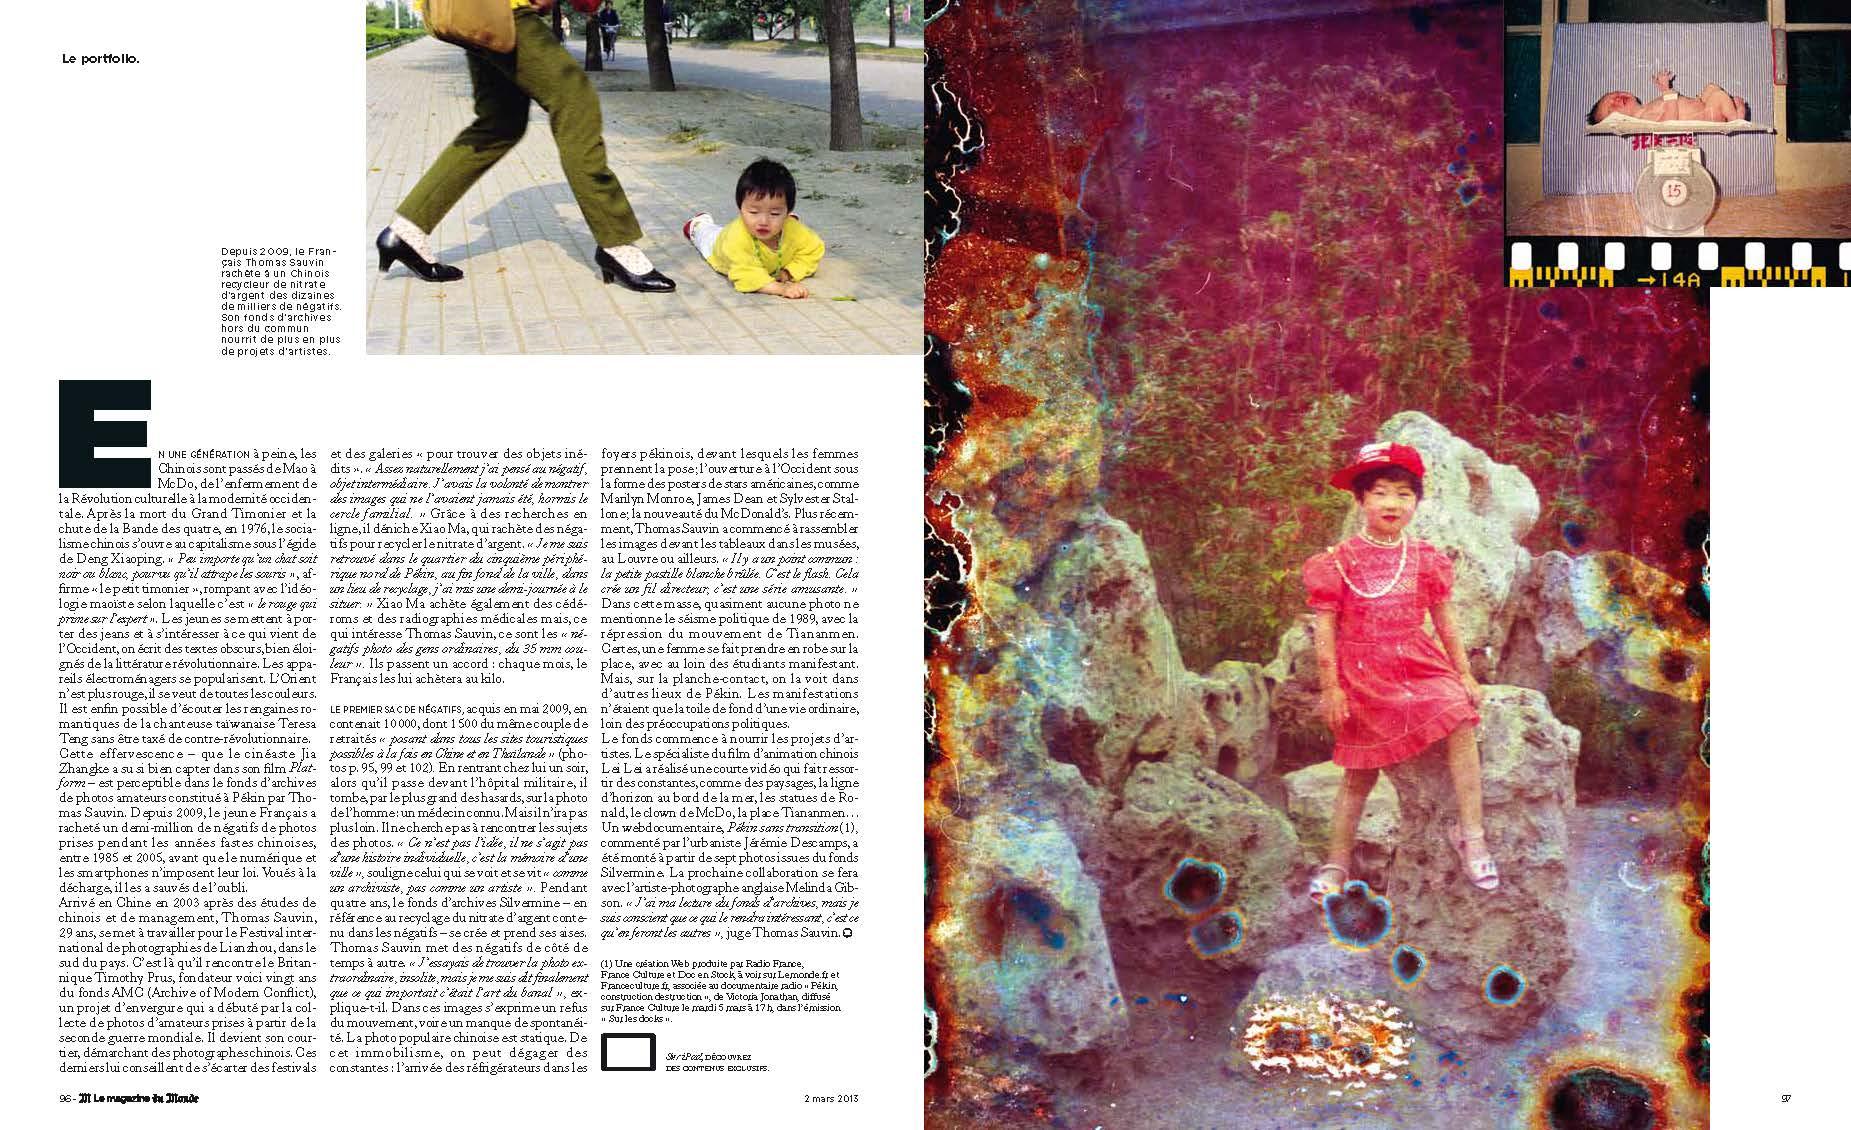 M le Magazine - 20130302 - Silvermine_Page_2.jpg